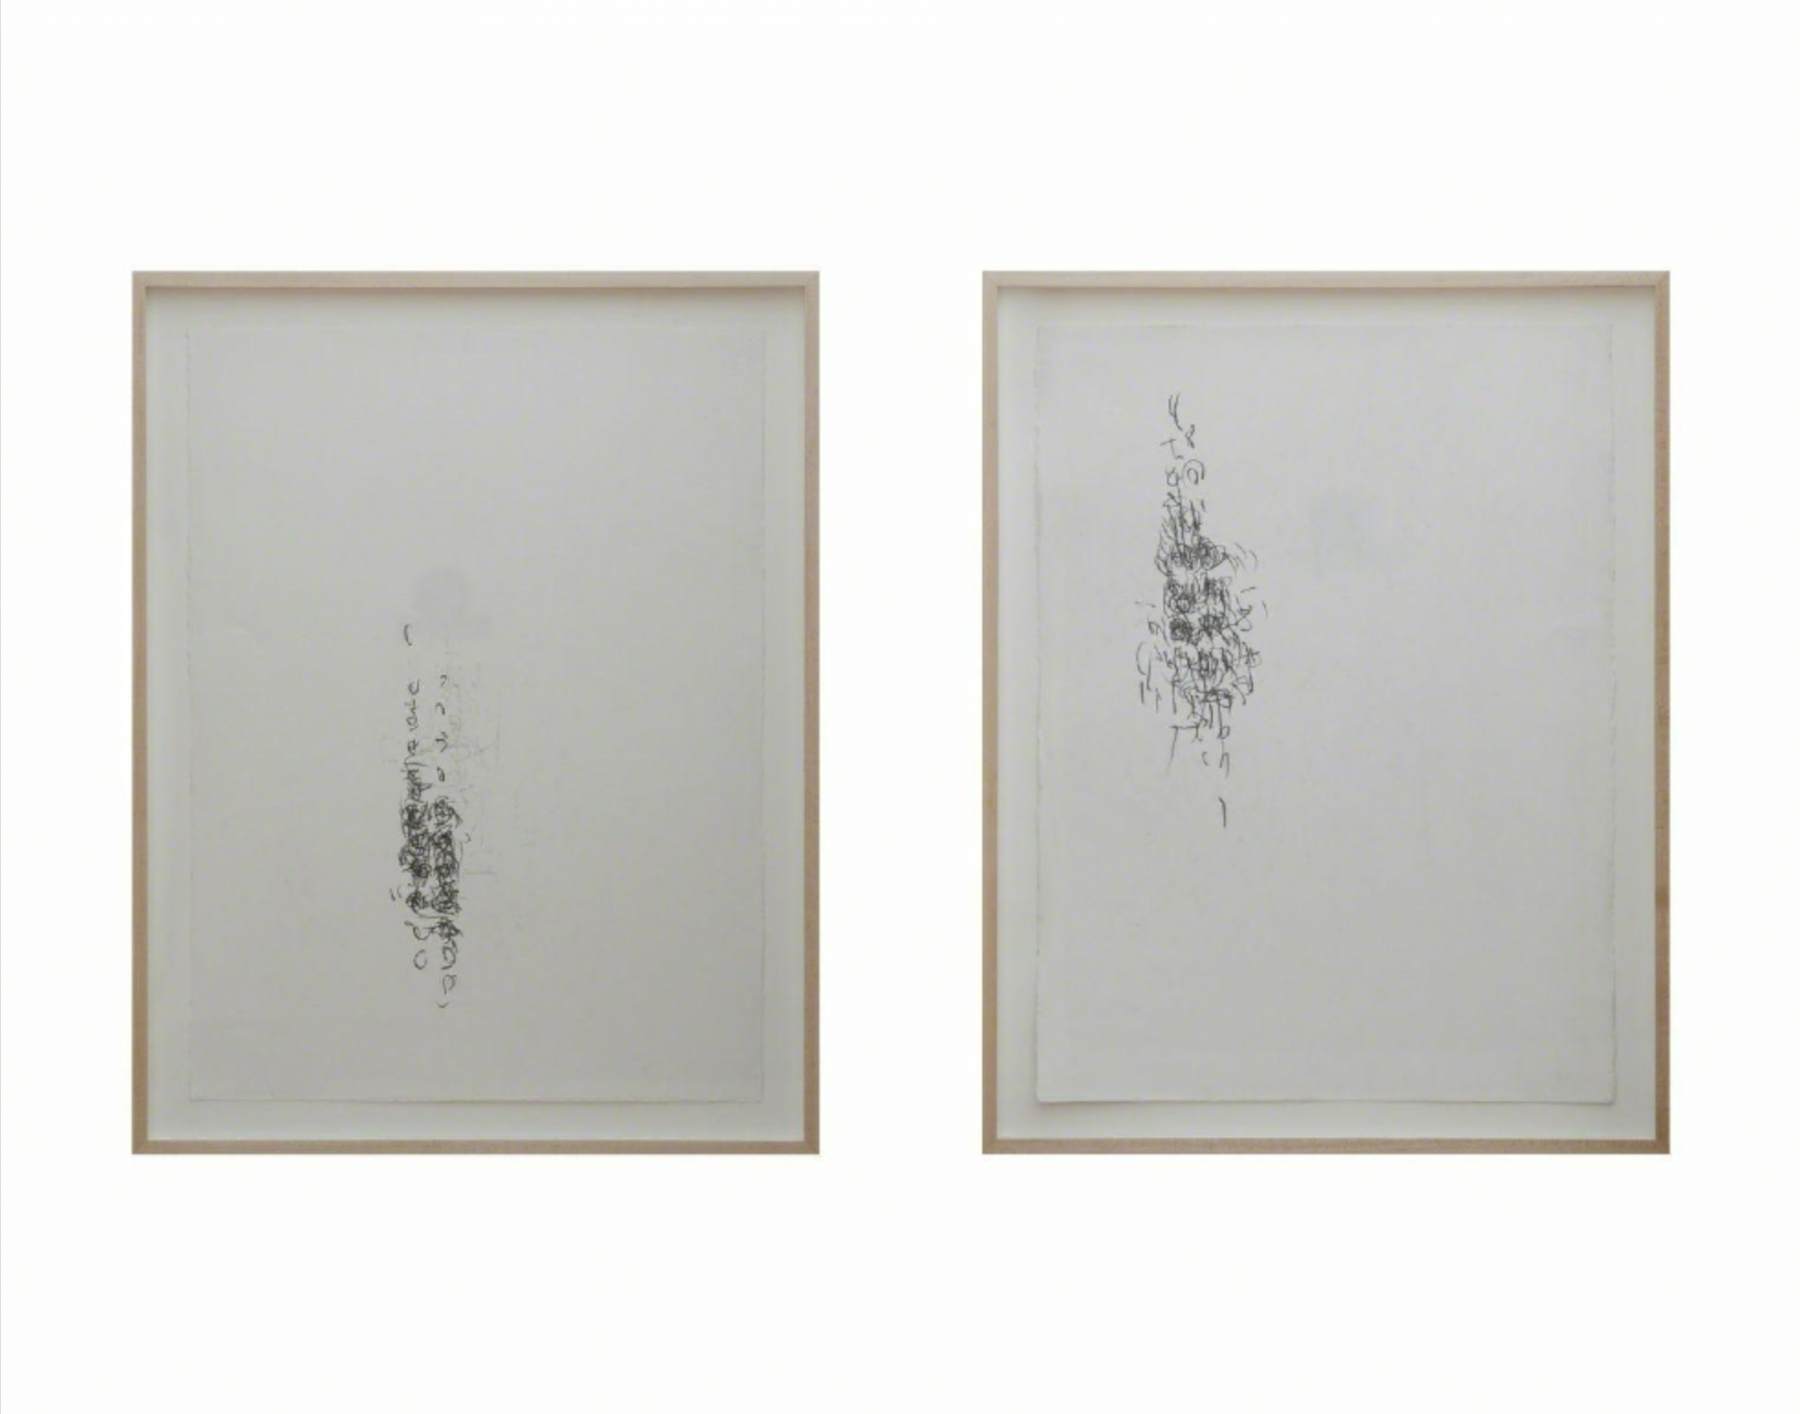 Untitled I and Untitled II